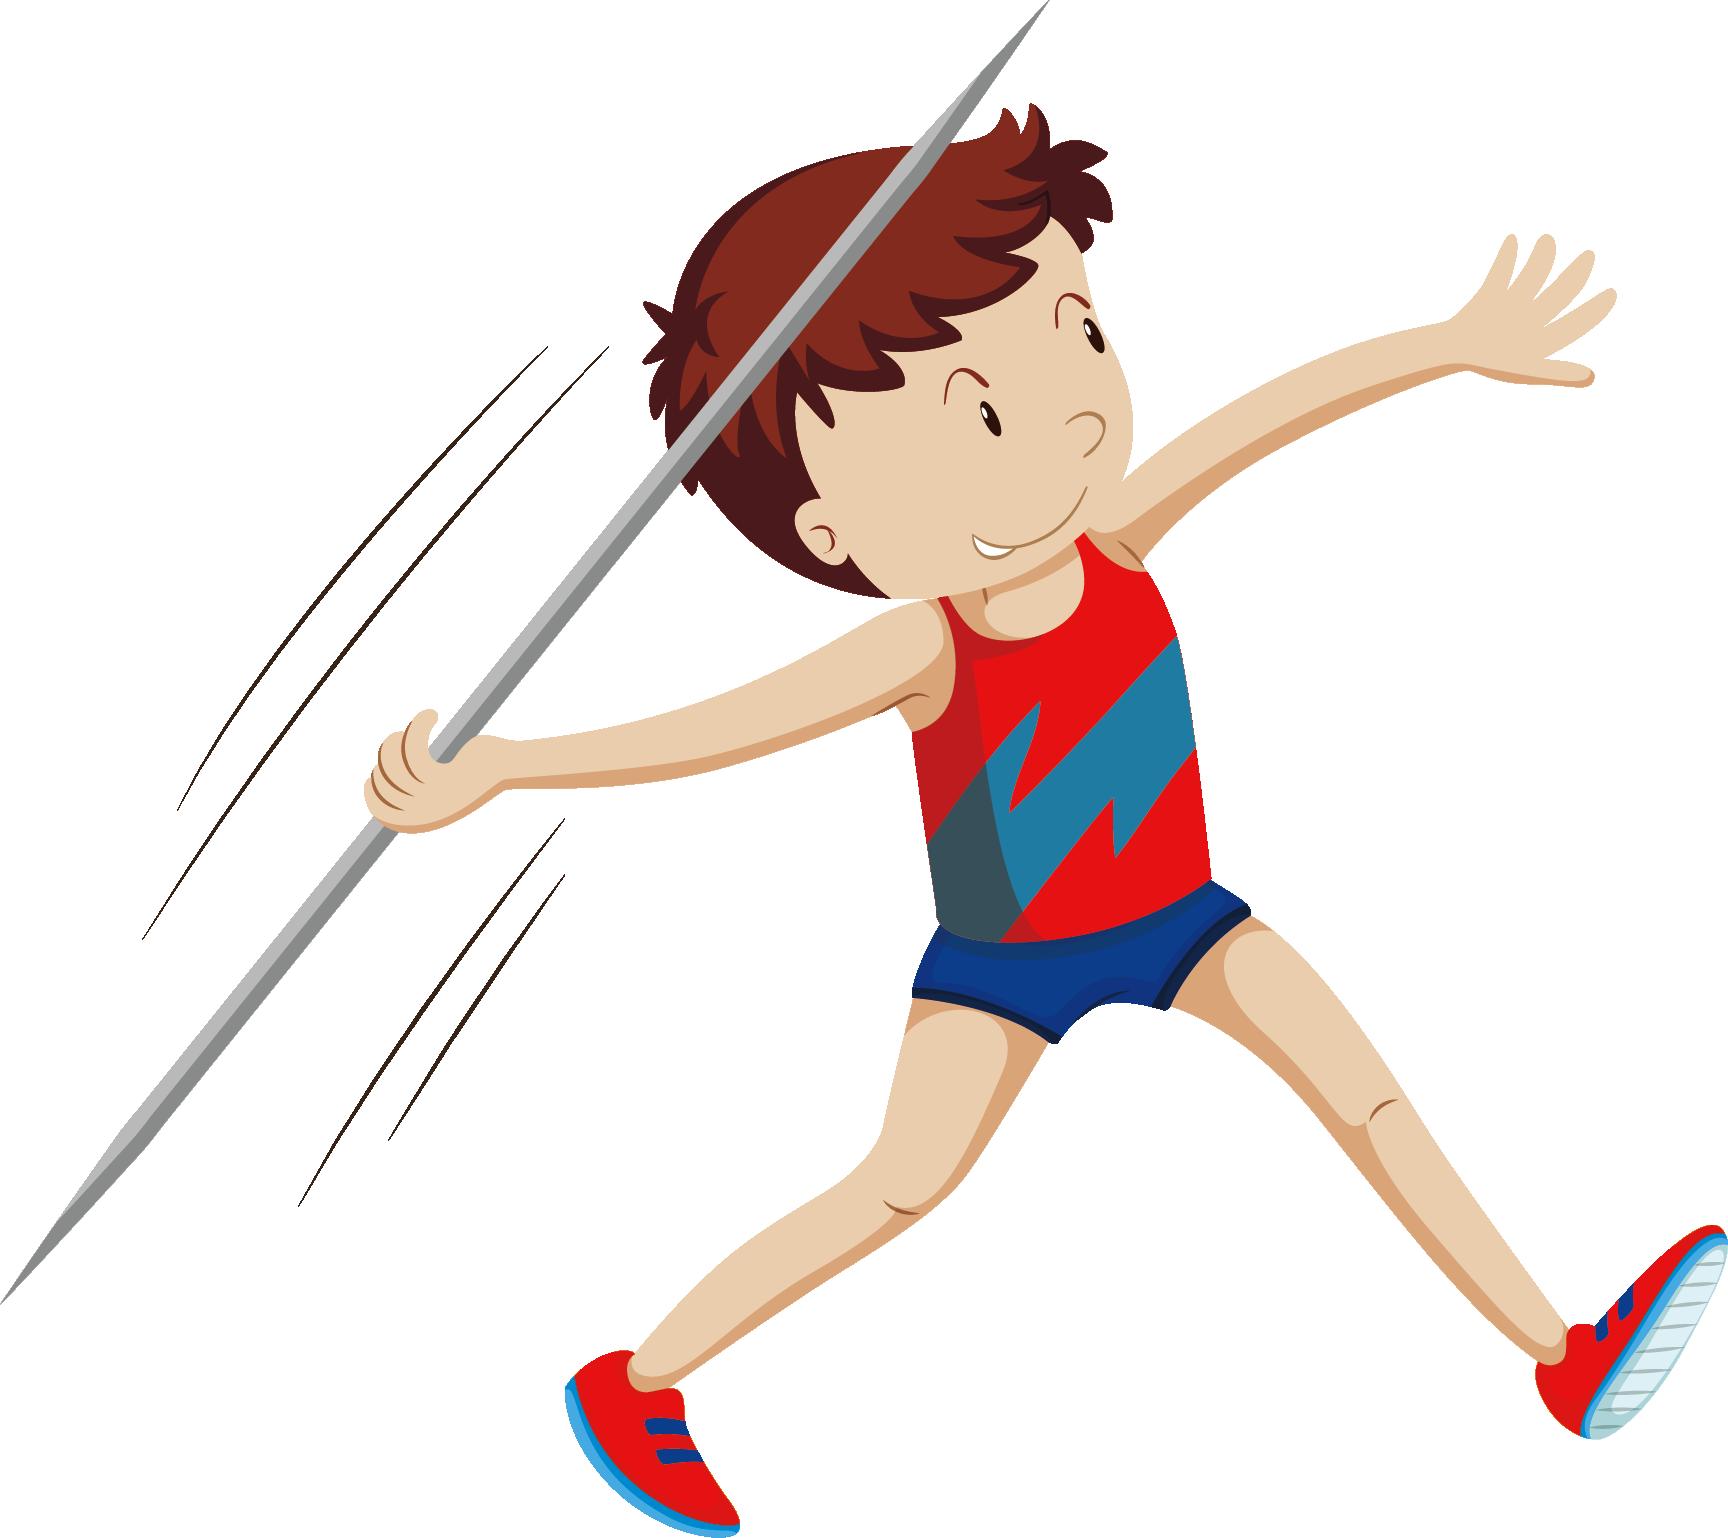 Javelin throw athlete illustration. Games clipart athletics games